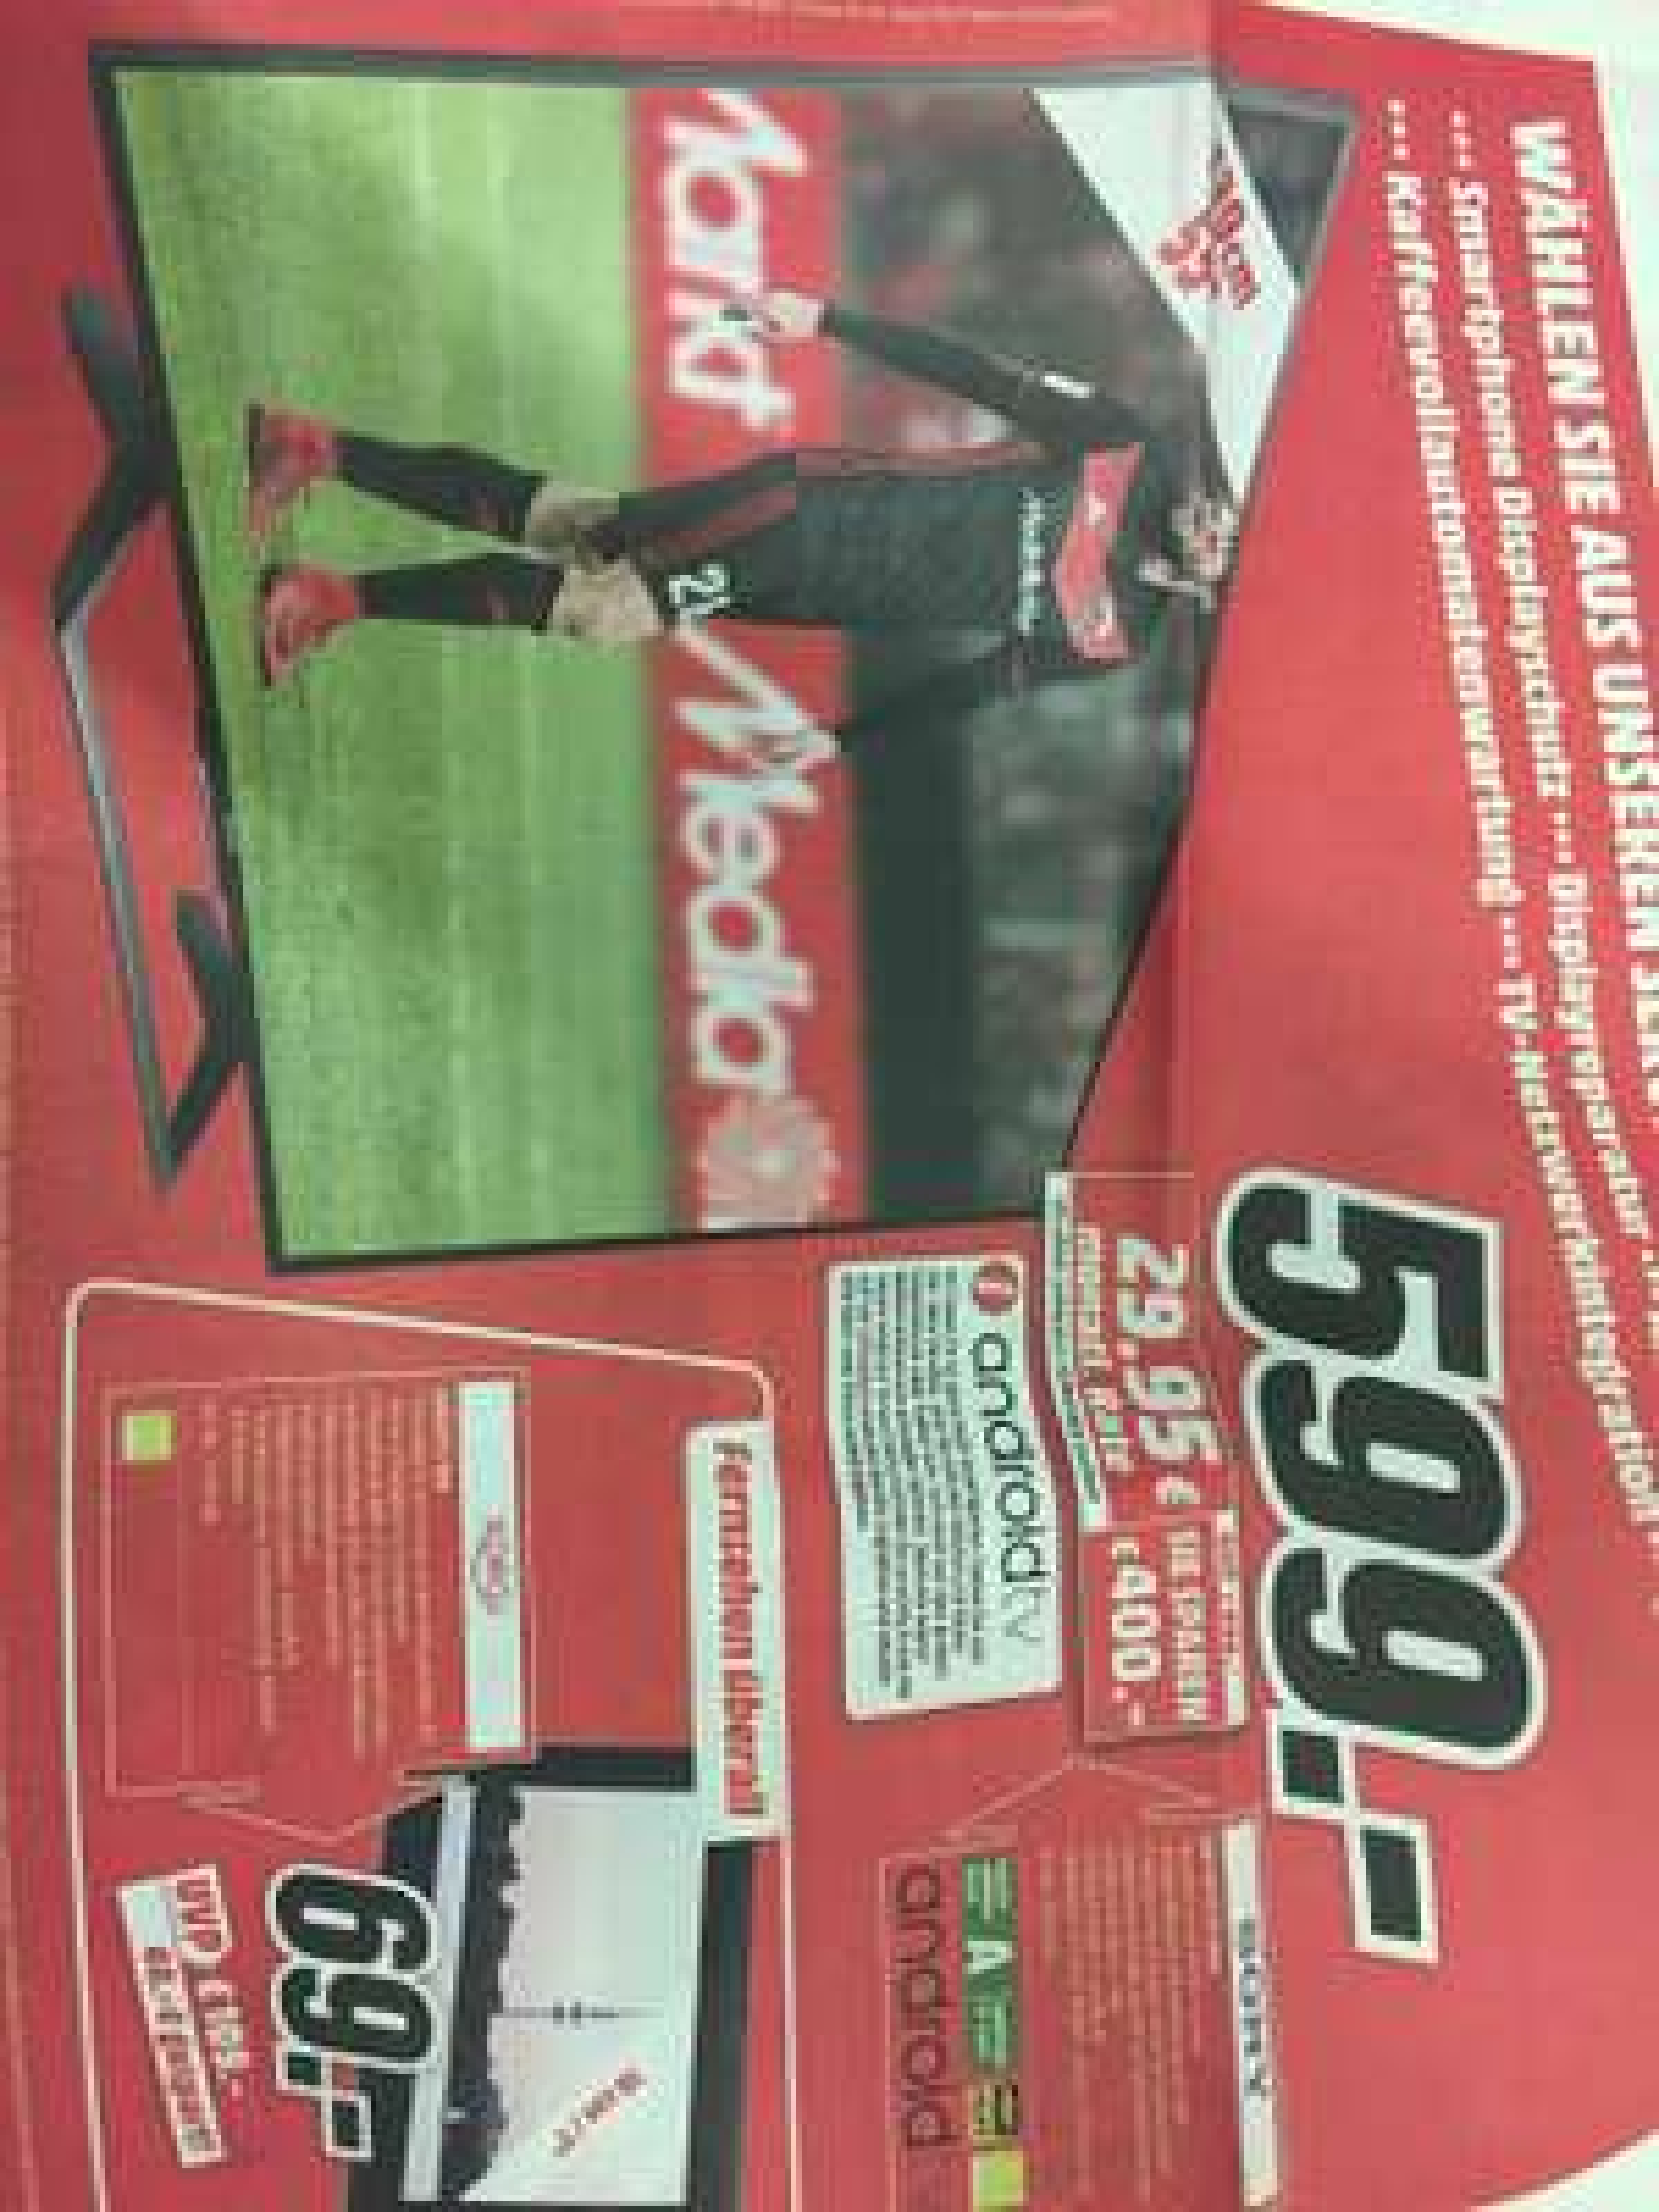 Sony KD 55 XE 8096 Lokal Media Markt Dortmund 599€